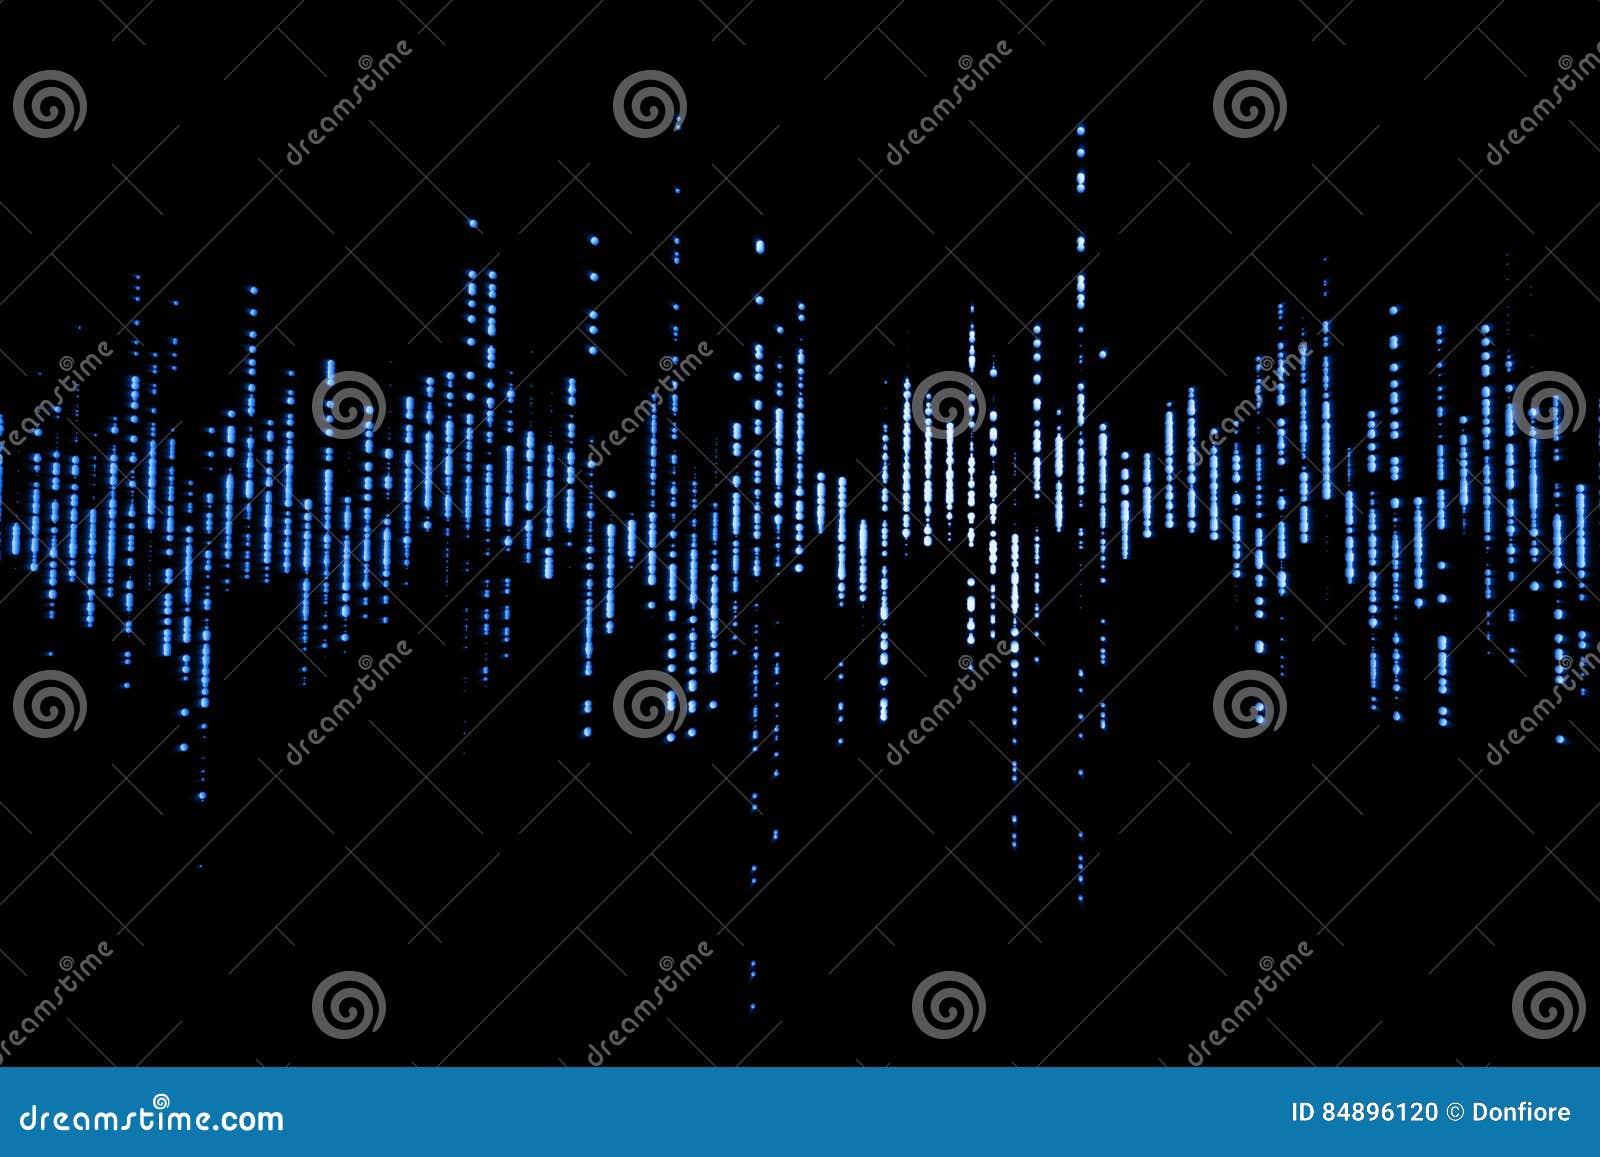 Blue digital equalizer audio sound waves on black background, stereo sound effect signal